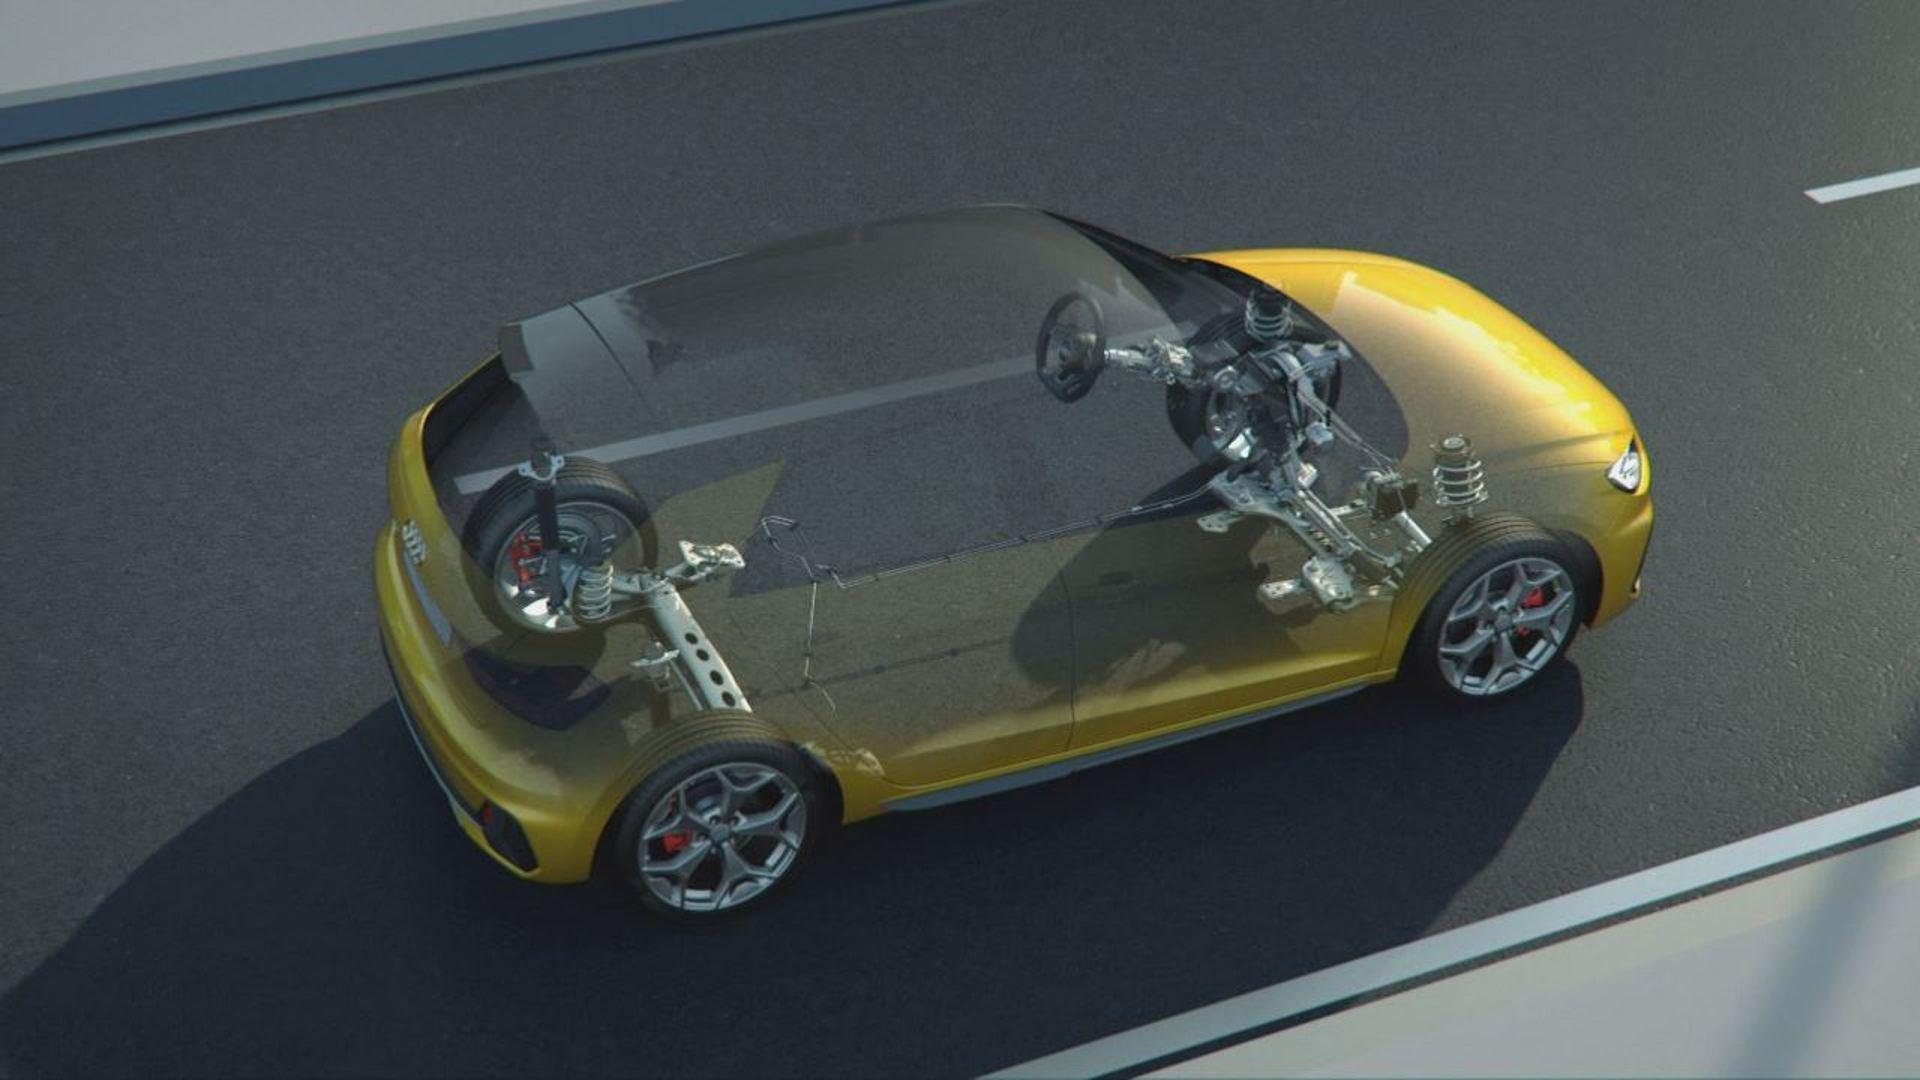 Audi A1 Sportback Fahrwerk (Animation)